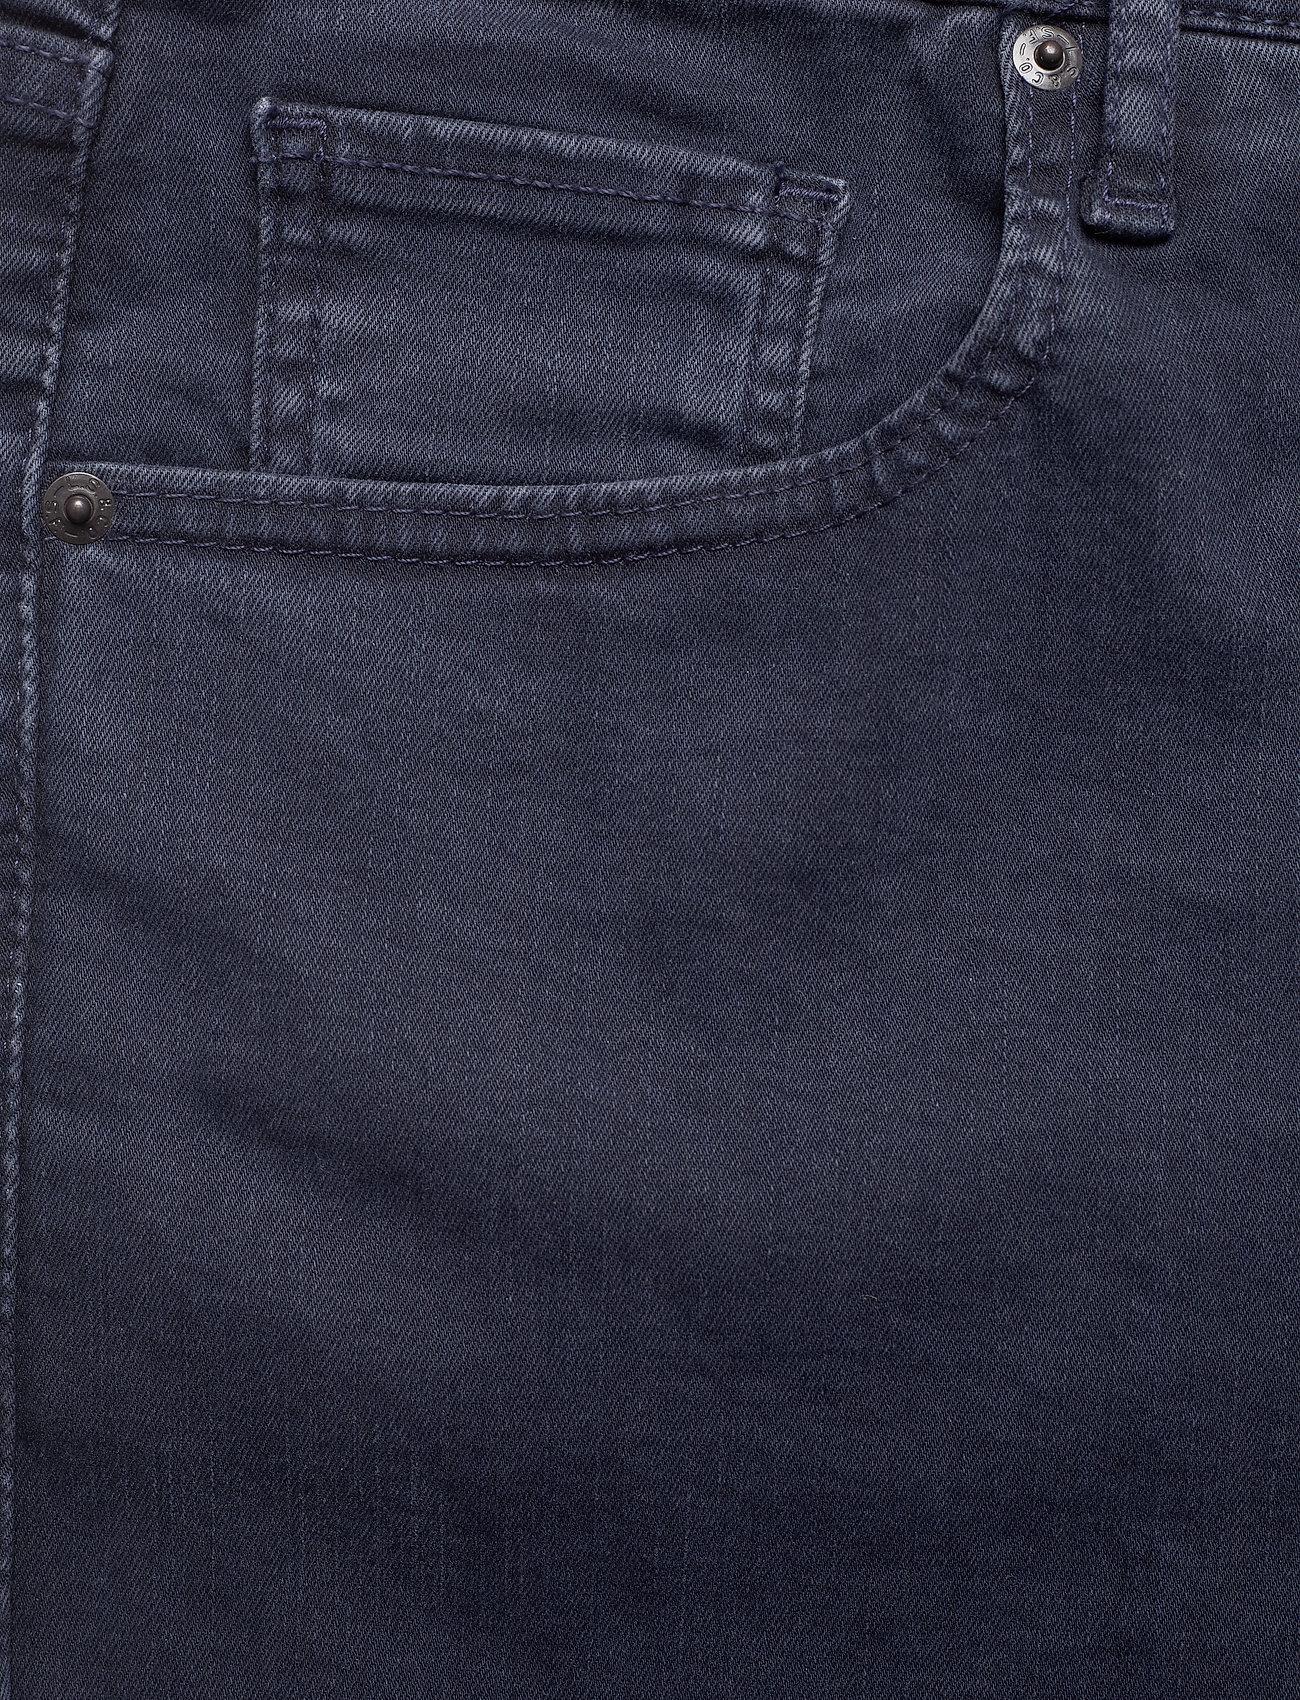 Levi's Plus Size - PLUS MILE HIGH SS BRUISED HEAR - skinny jeans - blacks - 2